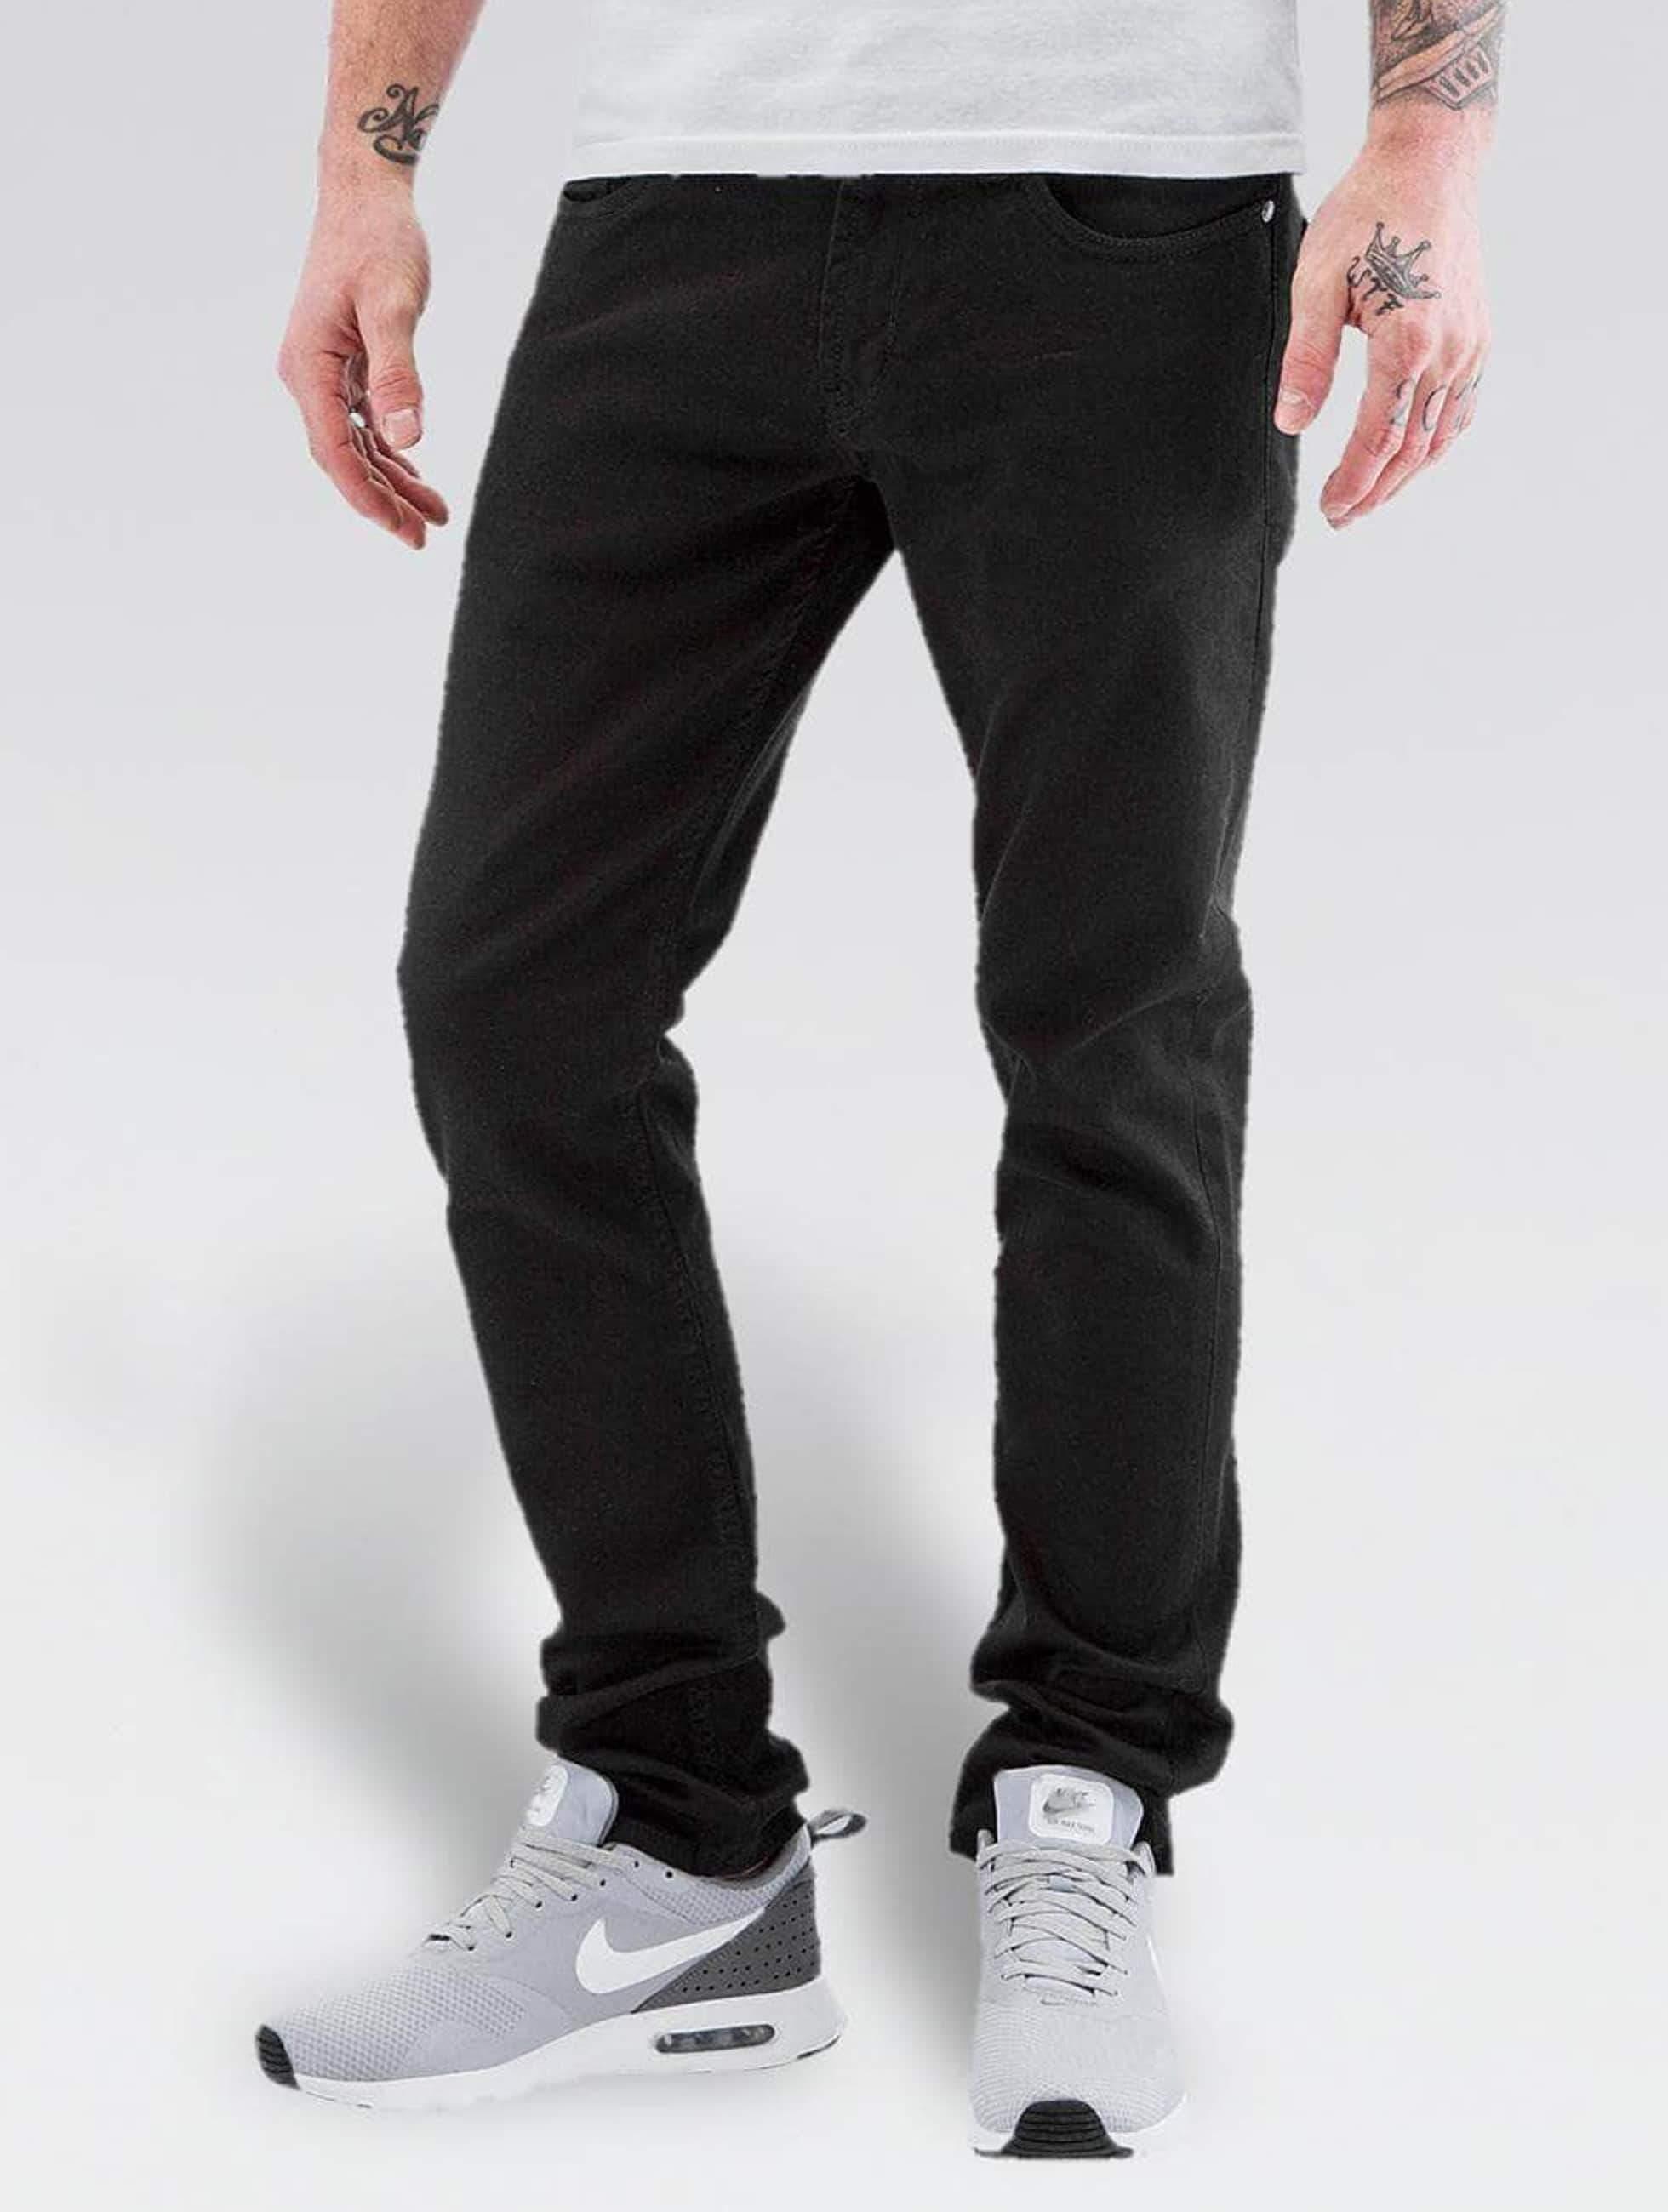 Reell Jeans Spider Slim Fit Jeans Black